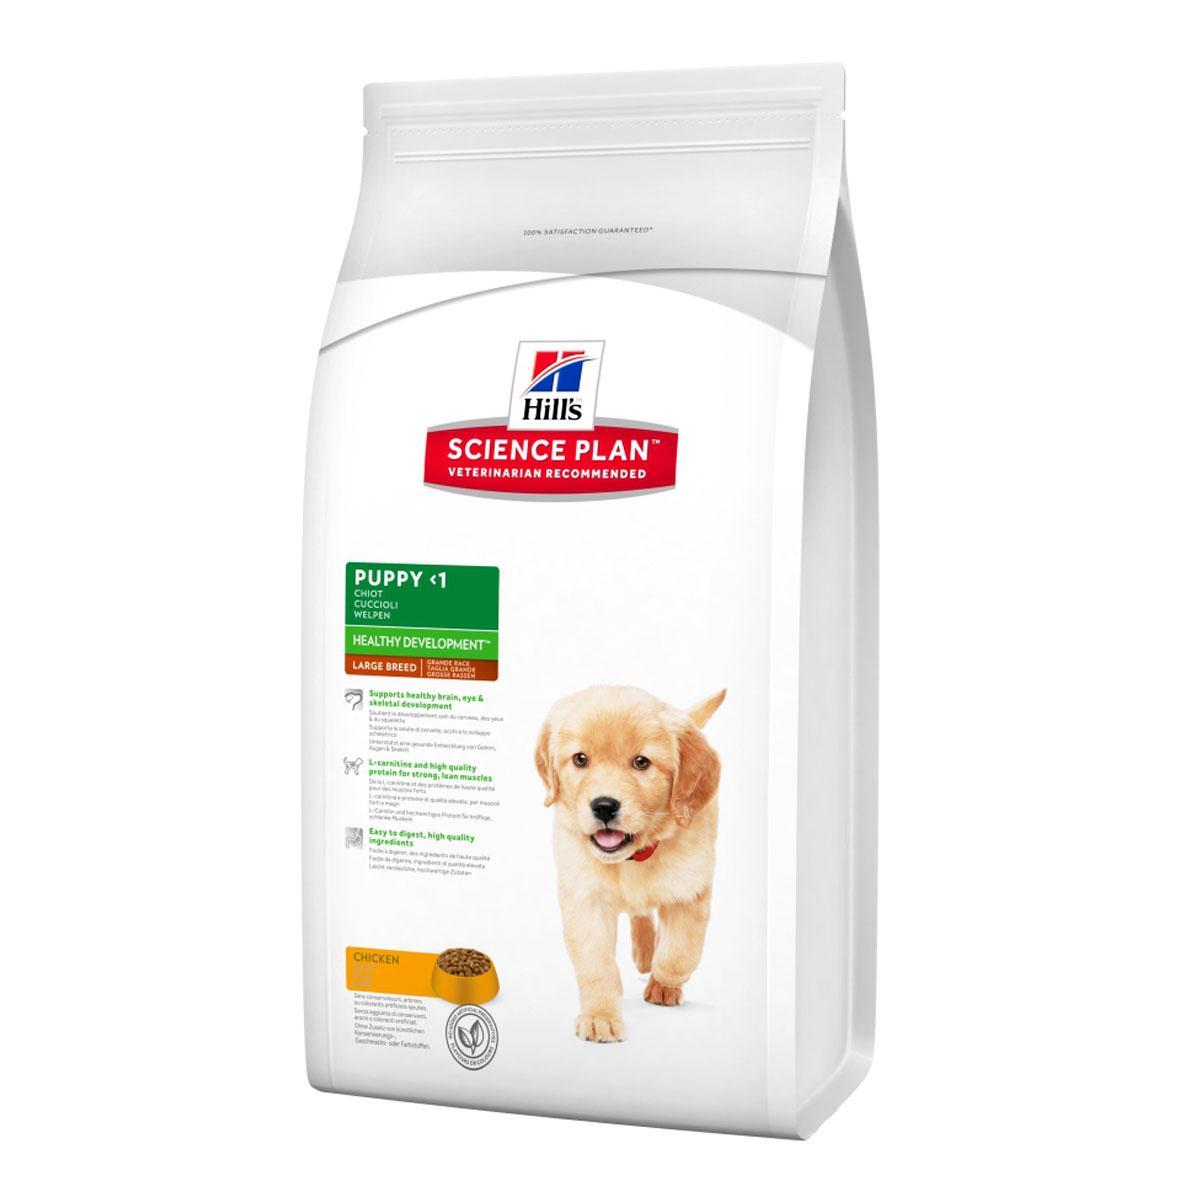 Hills Puppy Large Healthy Development Chicken Сухой корм для щенков крупных пород (Курица) / 16 кг